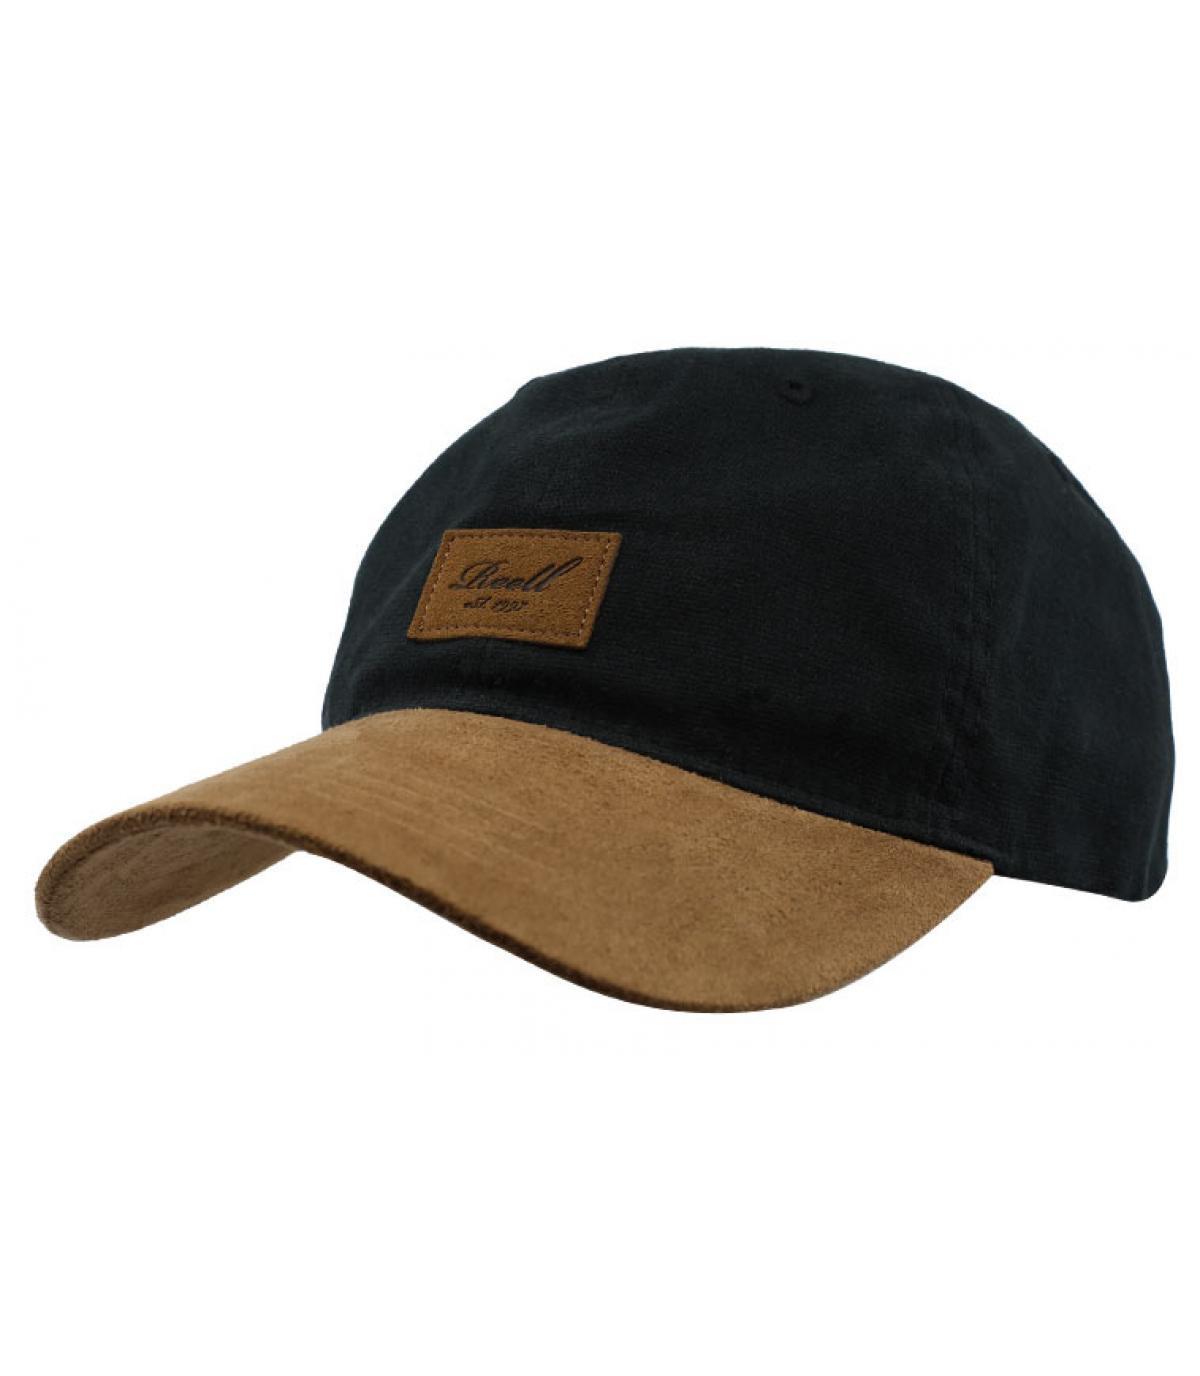 casquette noir suede Reell